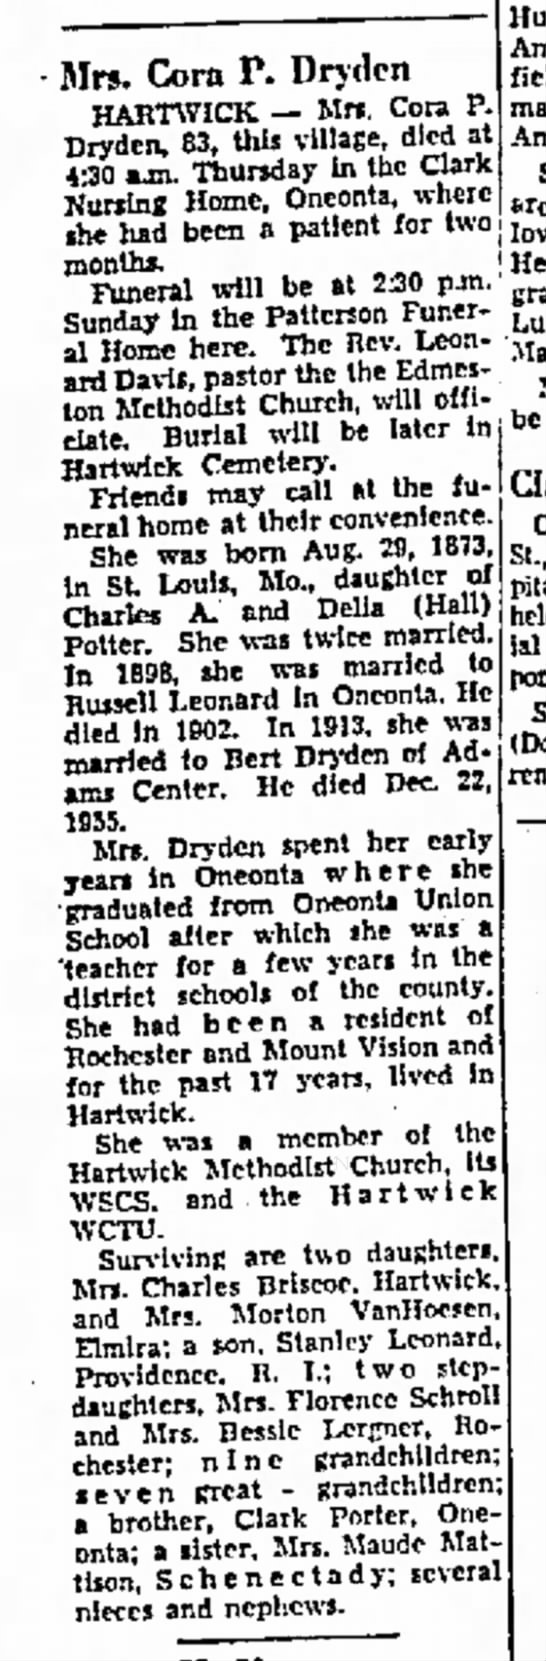 CORA P DRYDEN OBIT - JAN 25 1957